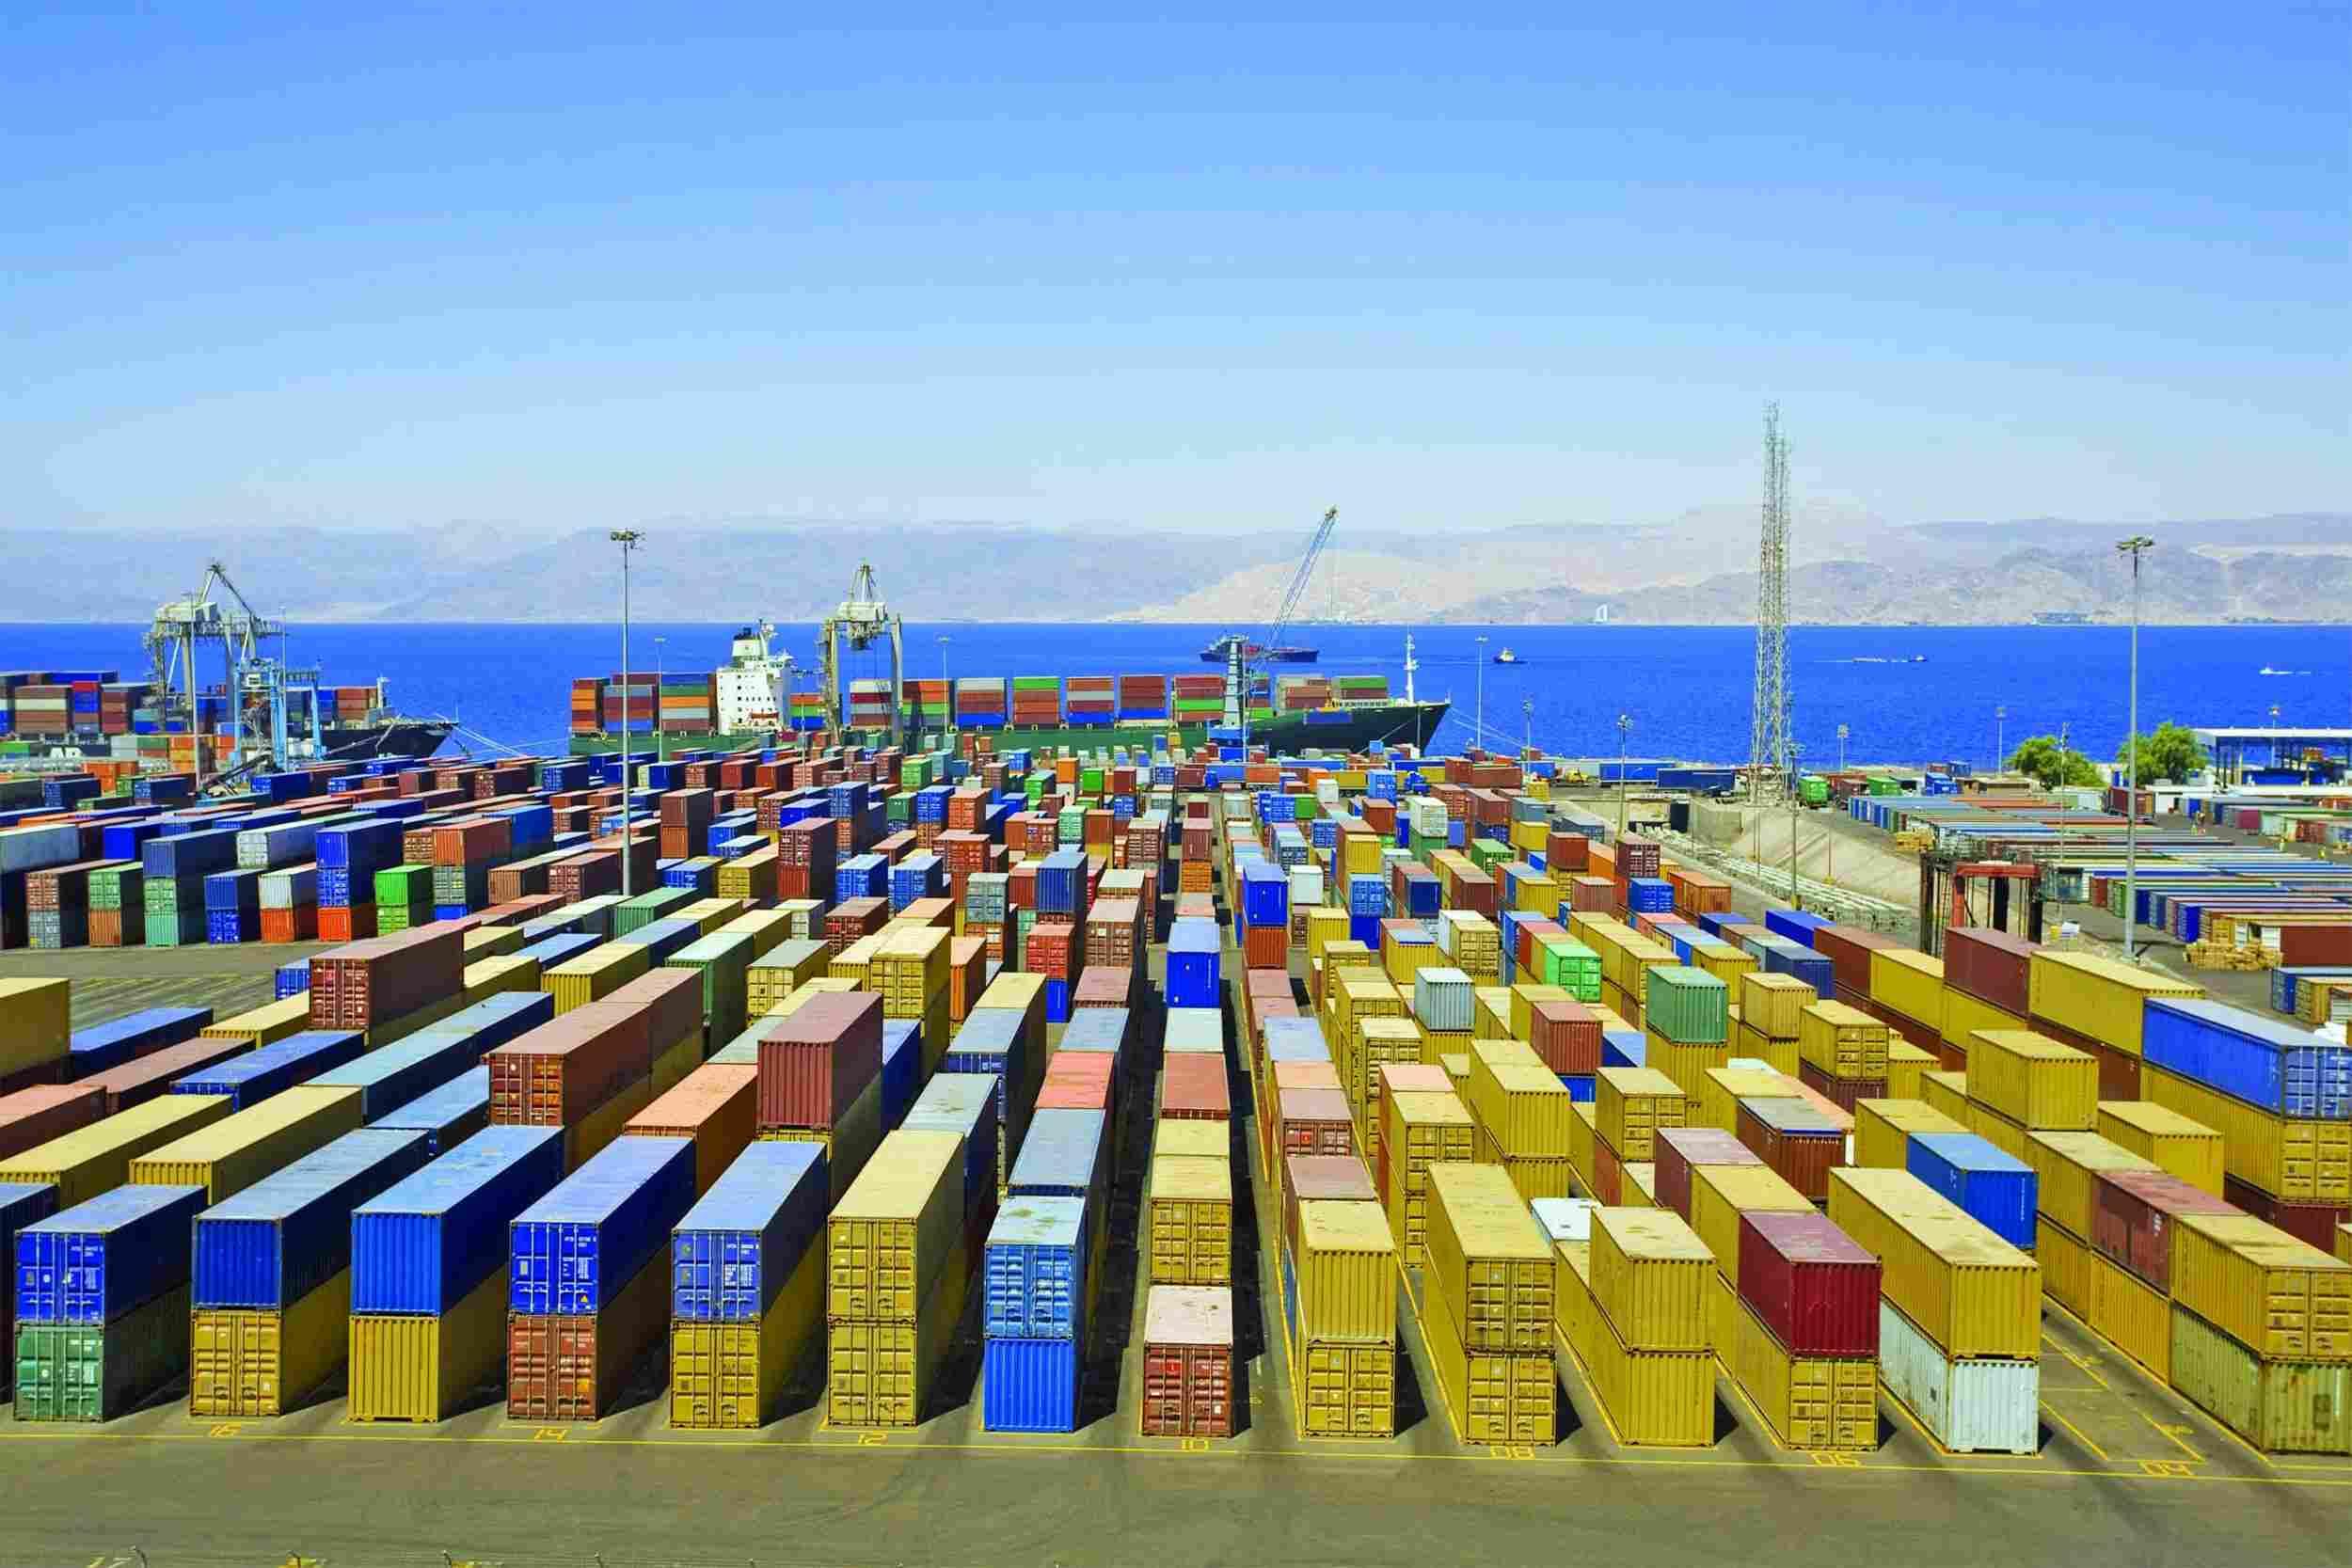 https://cargoprimeway.com/wp-content/uploads/2015/09/Harbor-warehouse.jpg